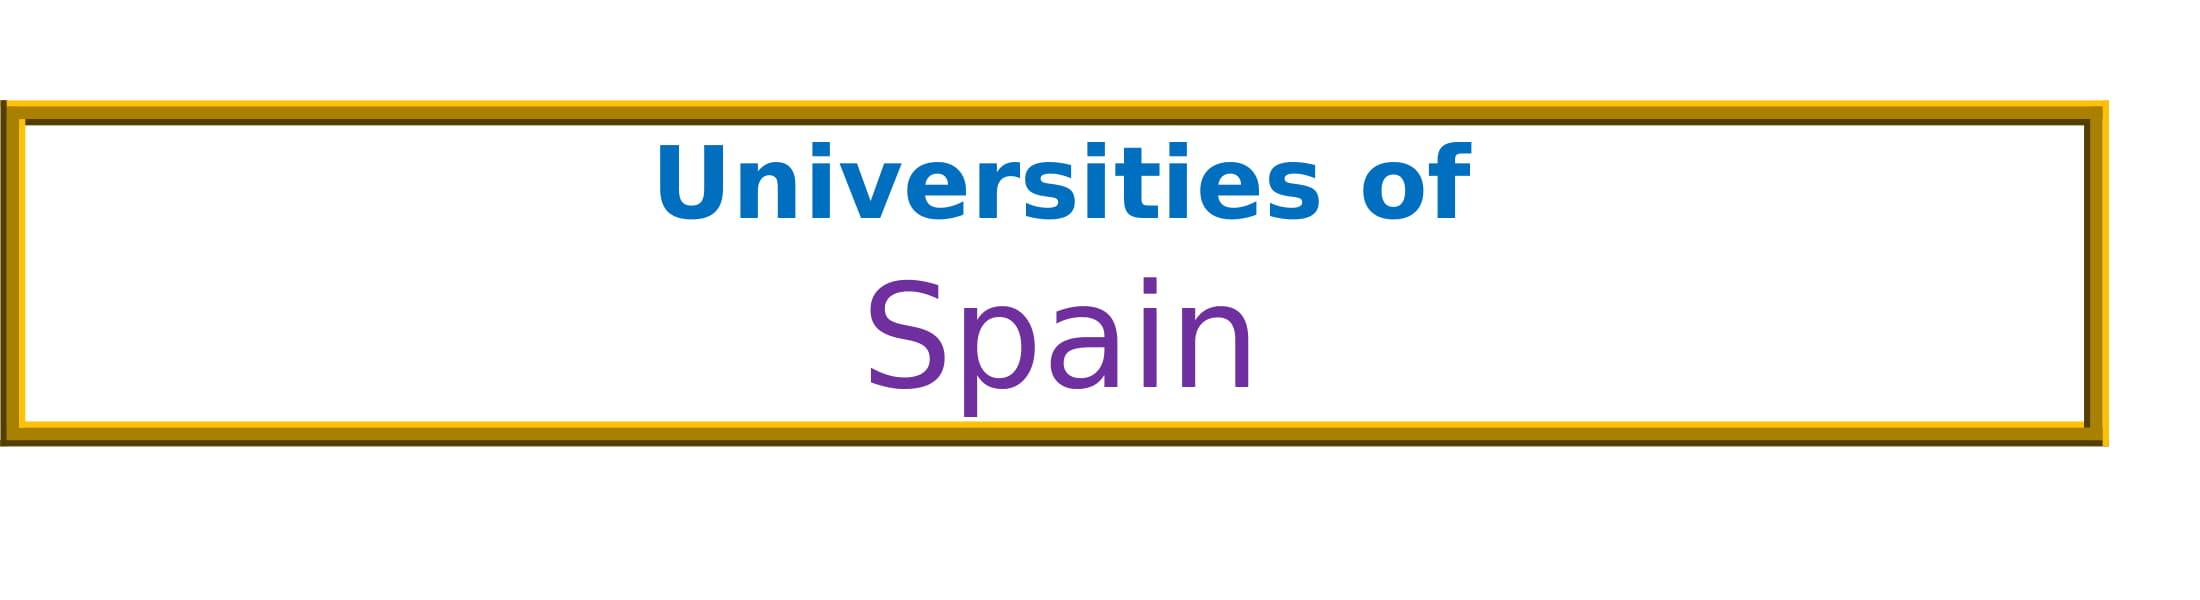 List of Universities in Spain